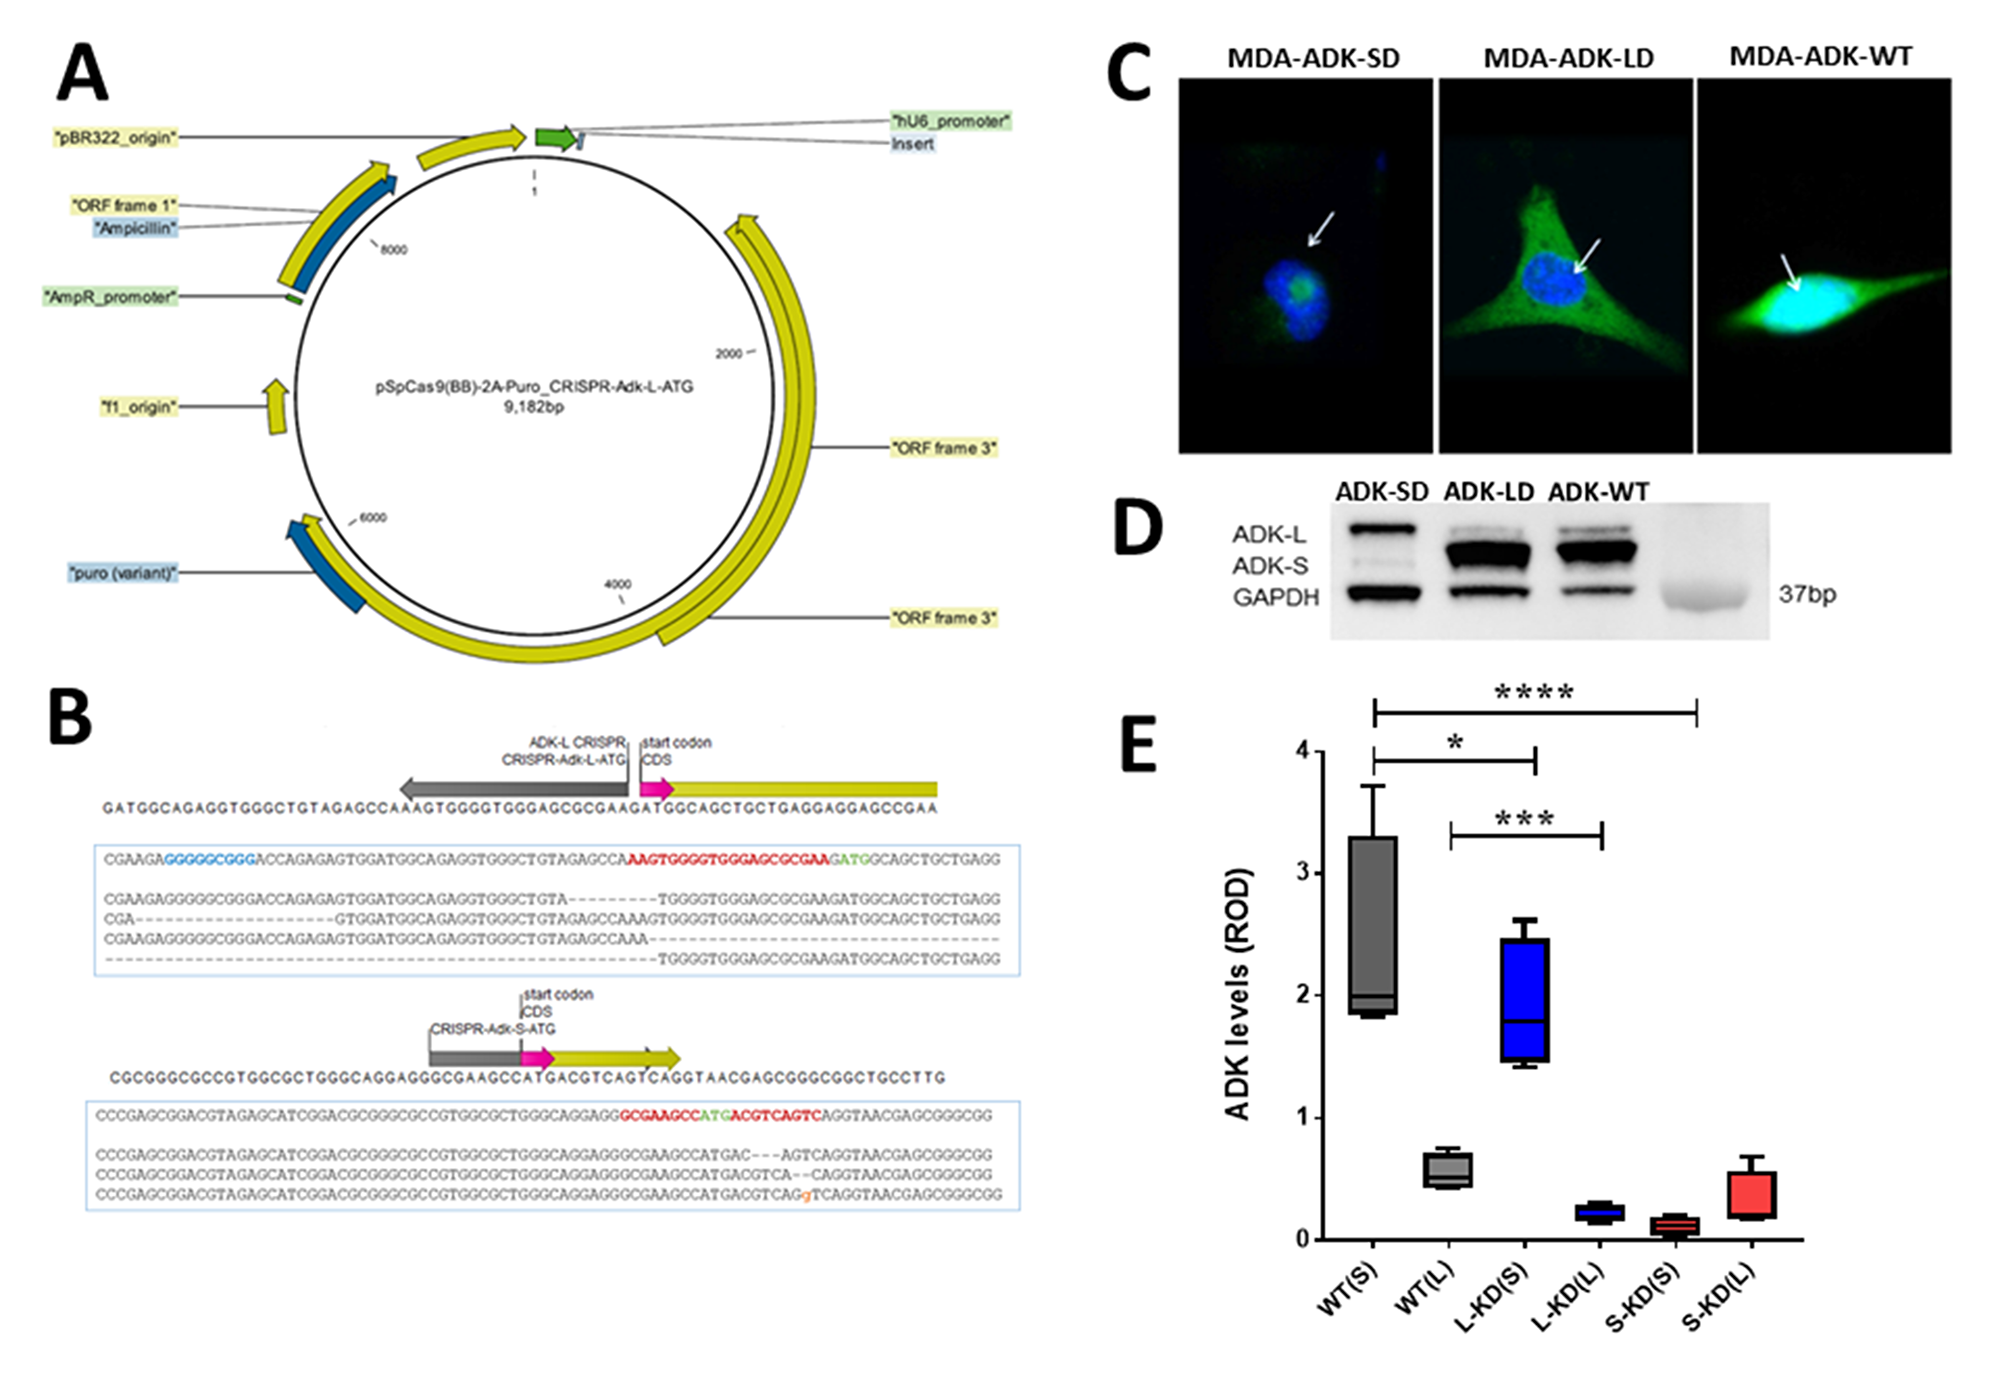 CRISPR/Cas9 manipulation of ADK isoforms in breast cancer cells.